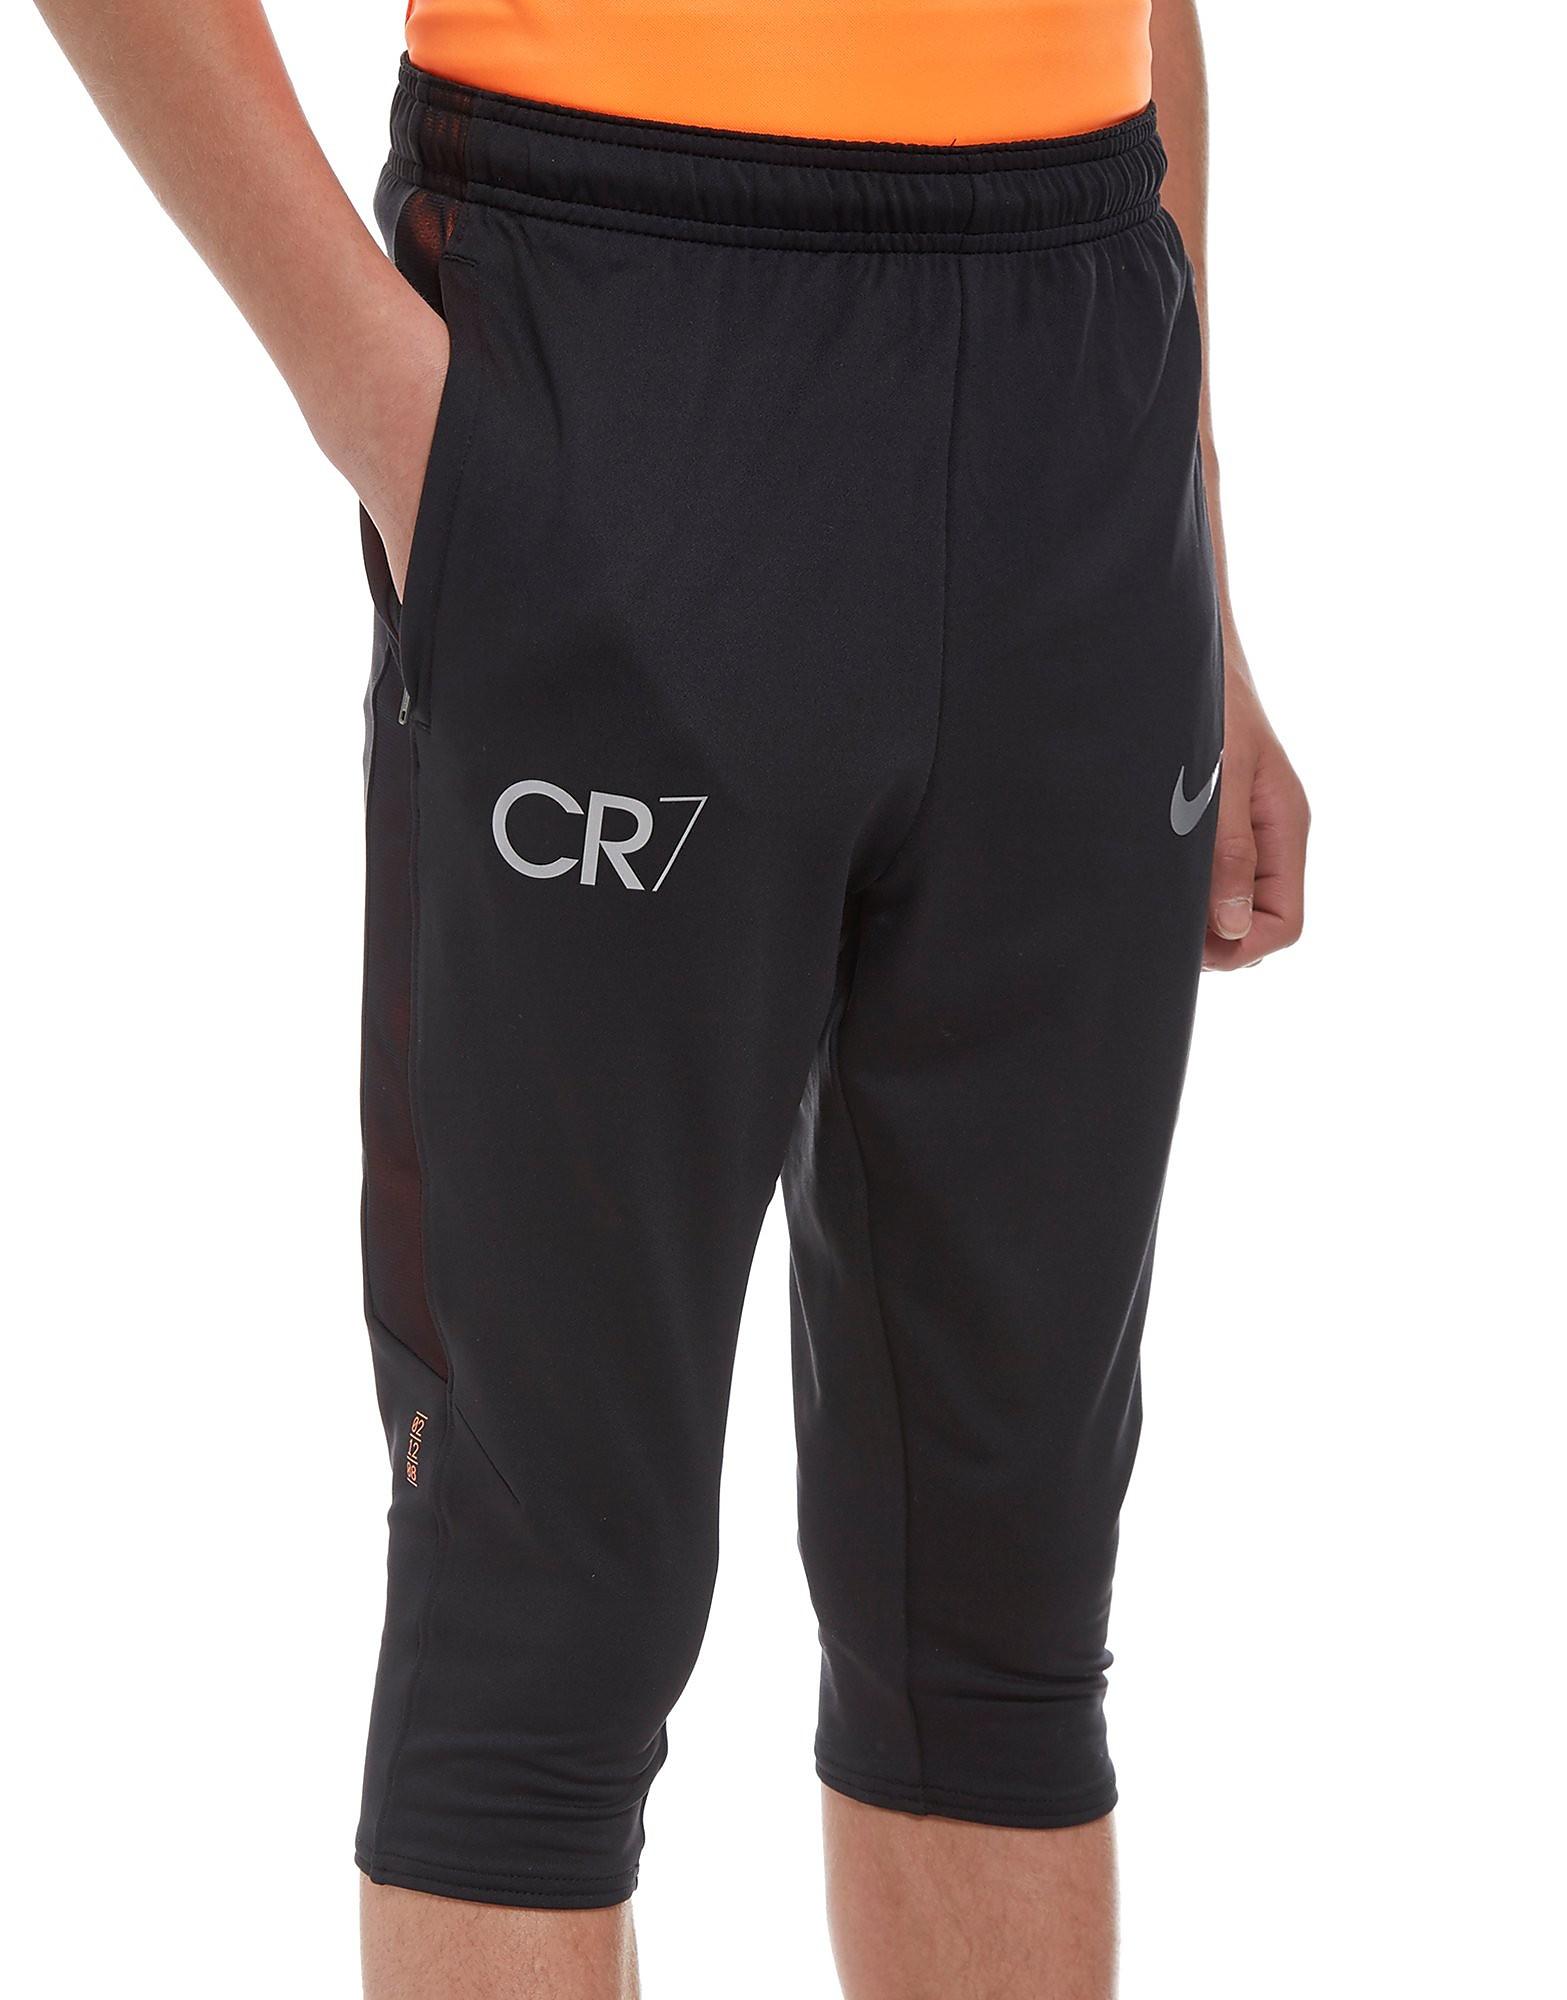 Nike Dry CR7 Squad Crop Trainingsbroek Junior